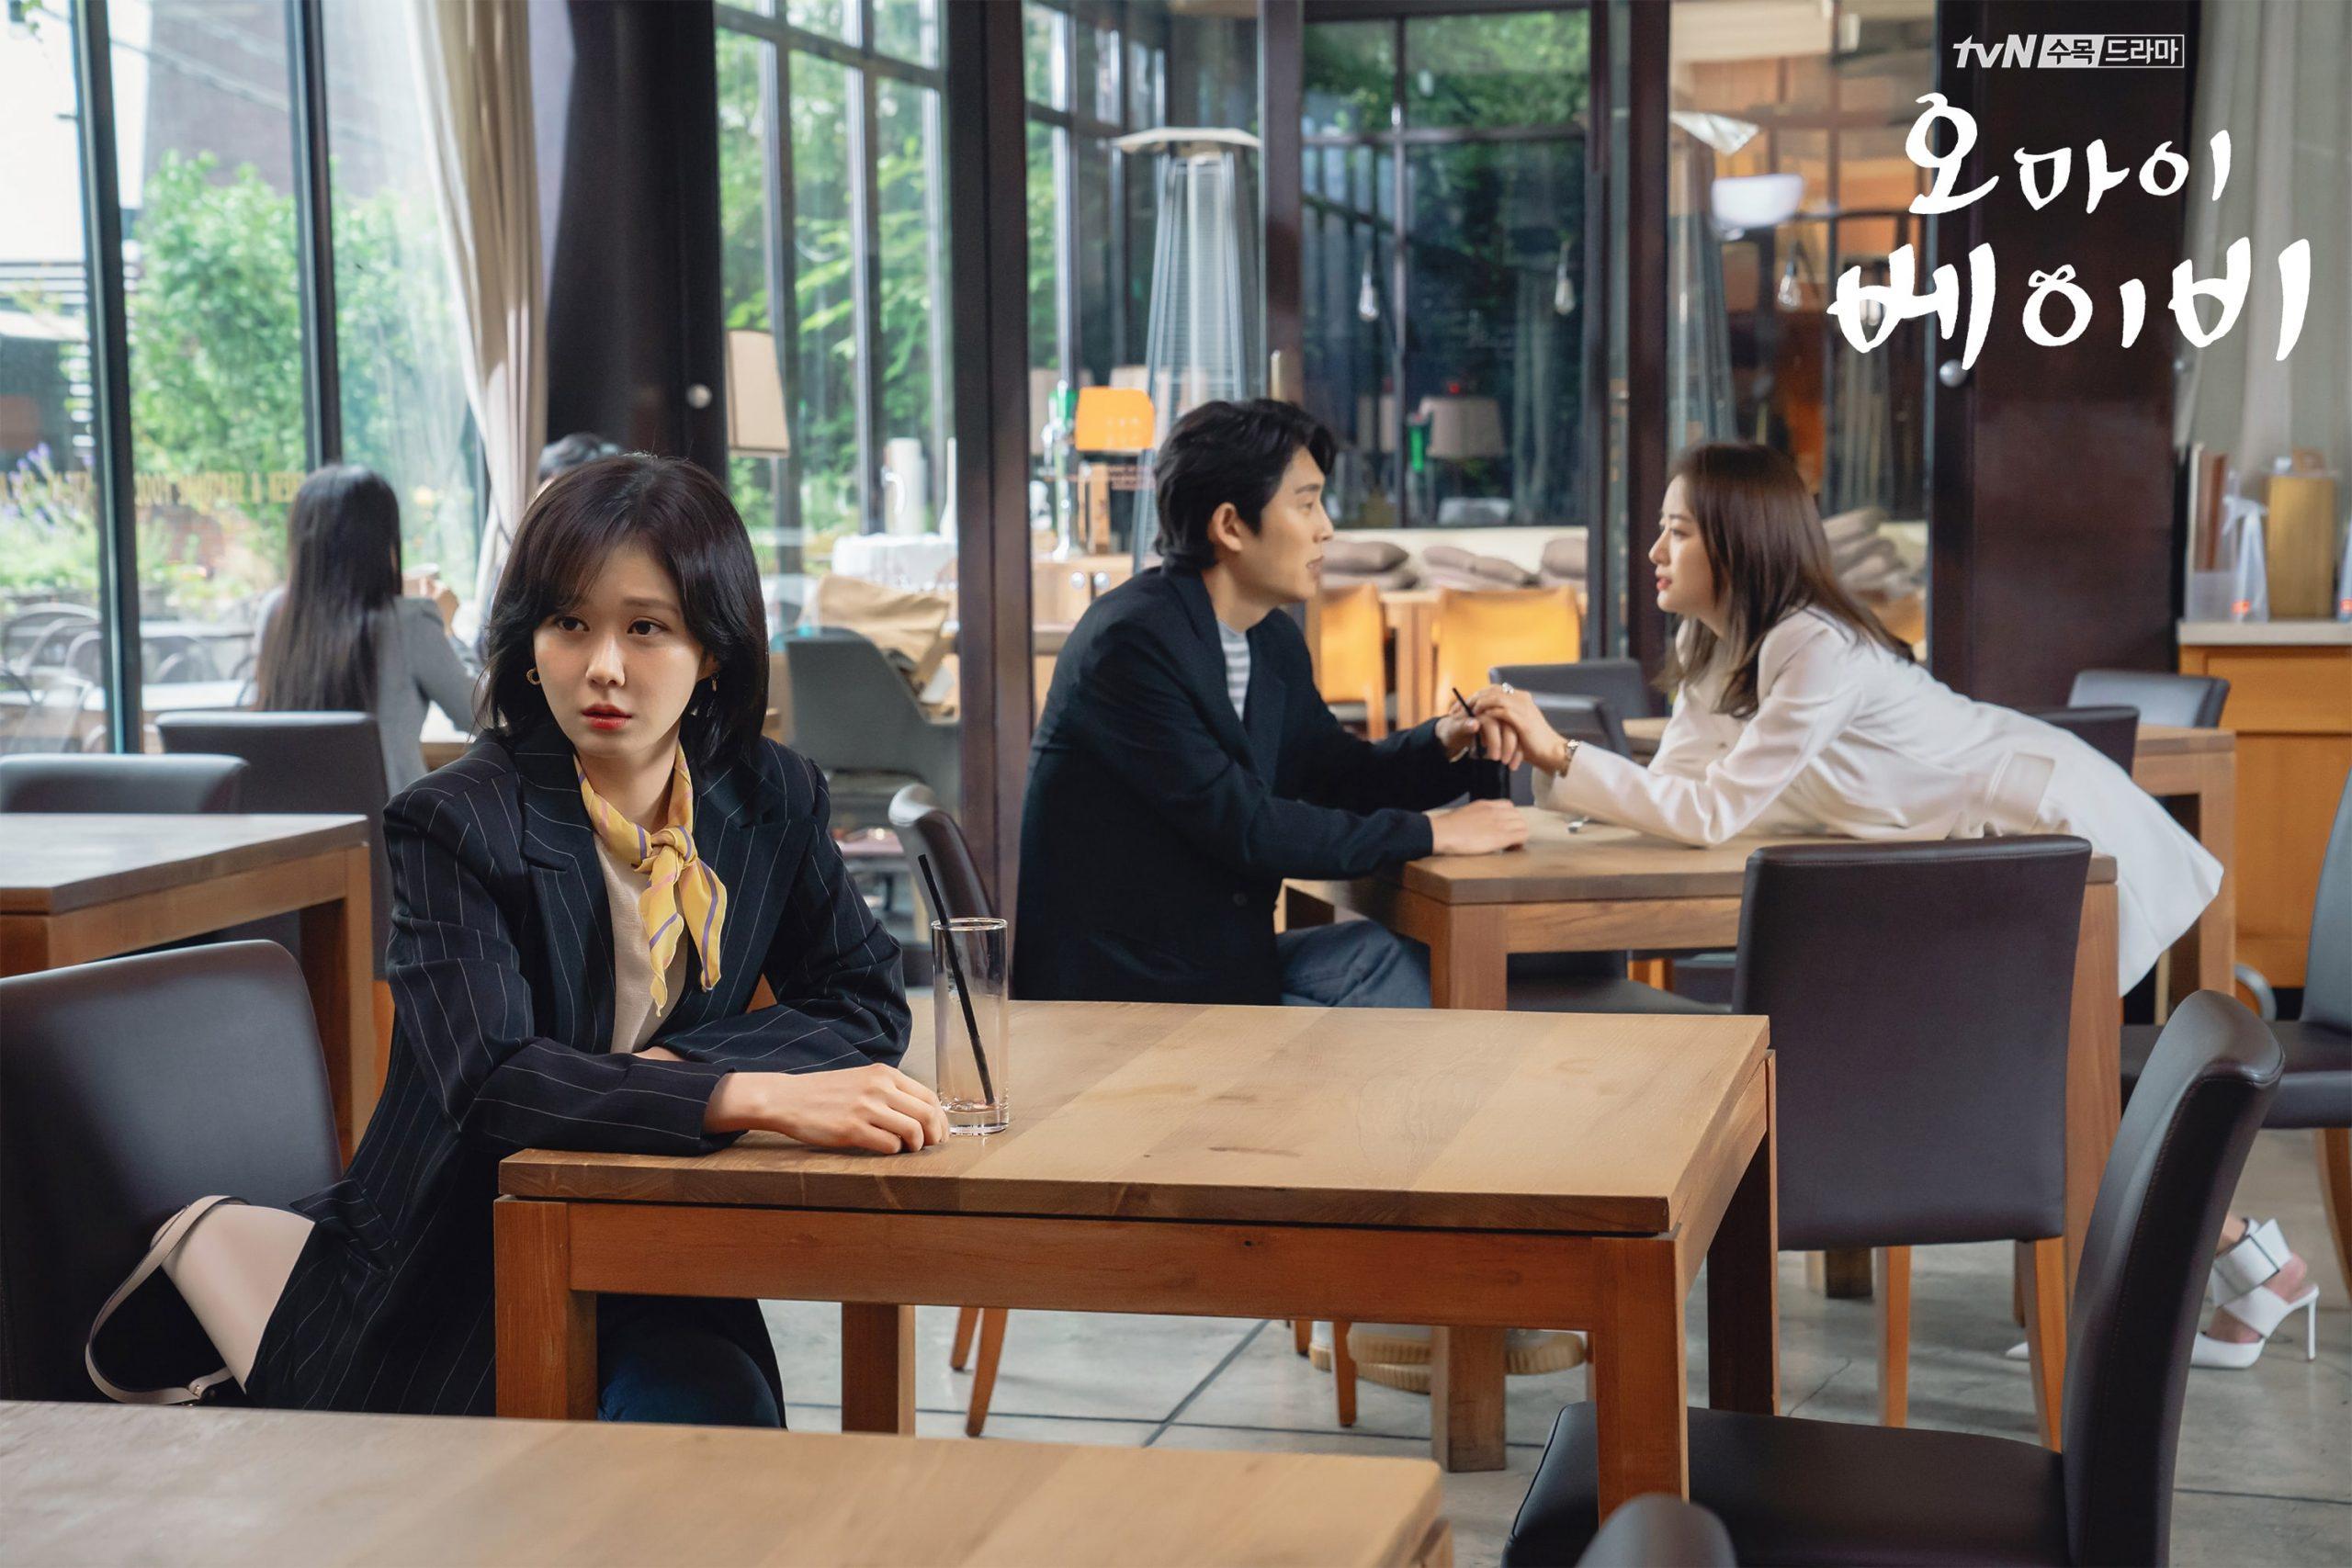 jeon-hye-bin-and-go-joon-make-jang-nara-jealous-in-oh-my-baby-2